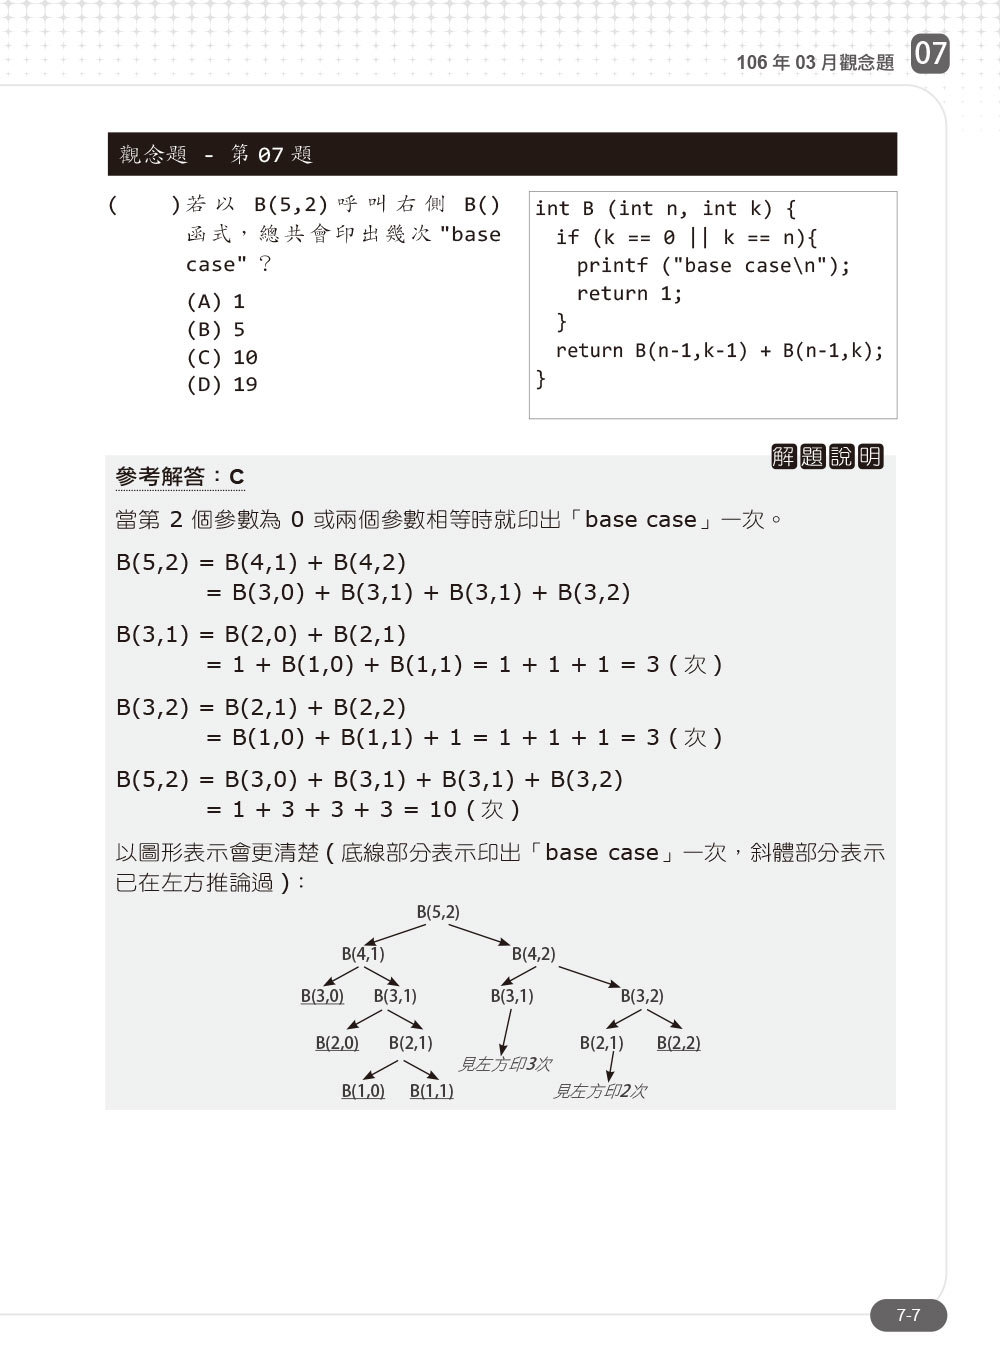 APCS 大學程式設計先修檢測最強考衝特訓班 -- C/C++ 解題攻略-preview-5